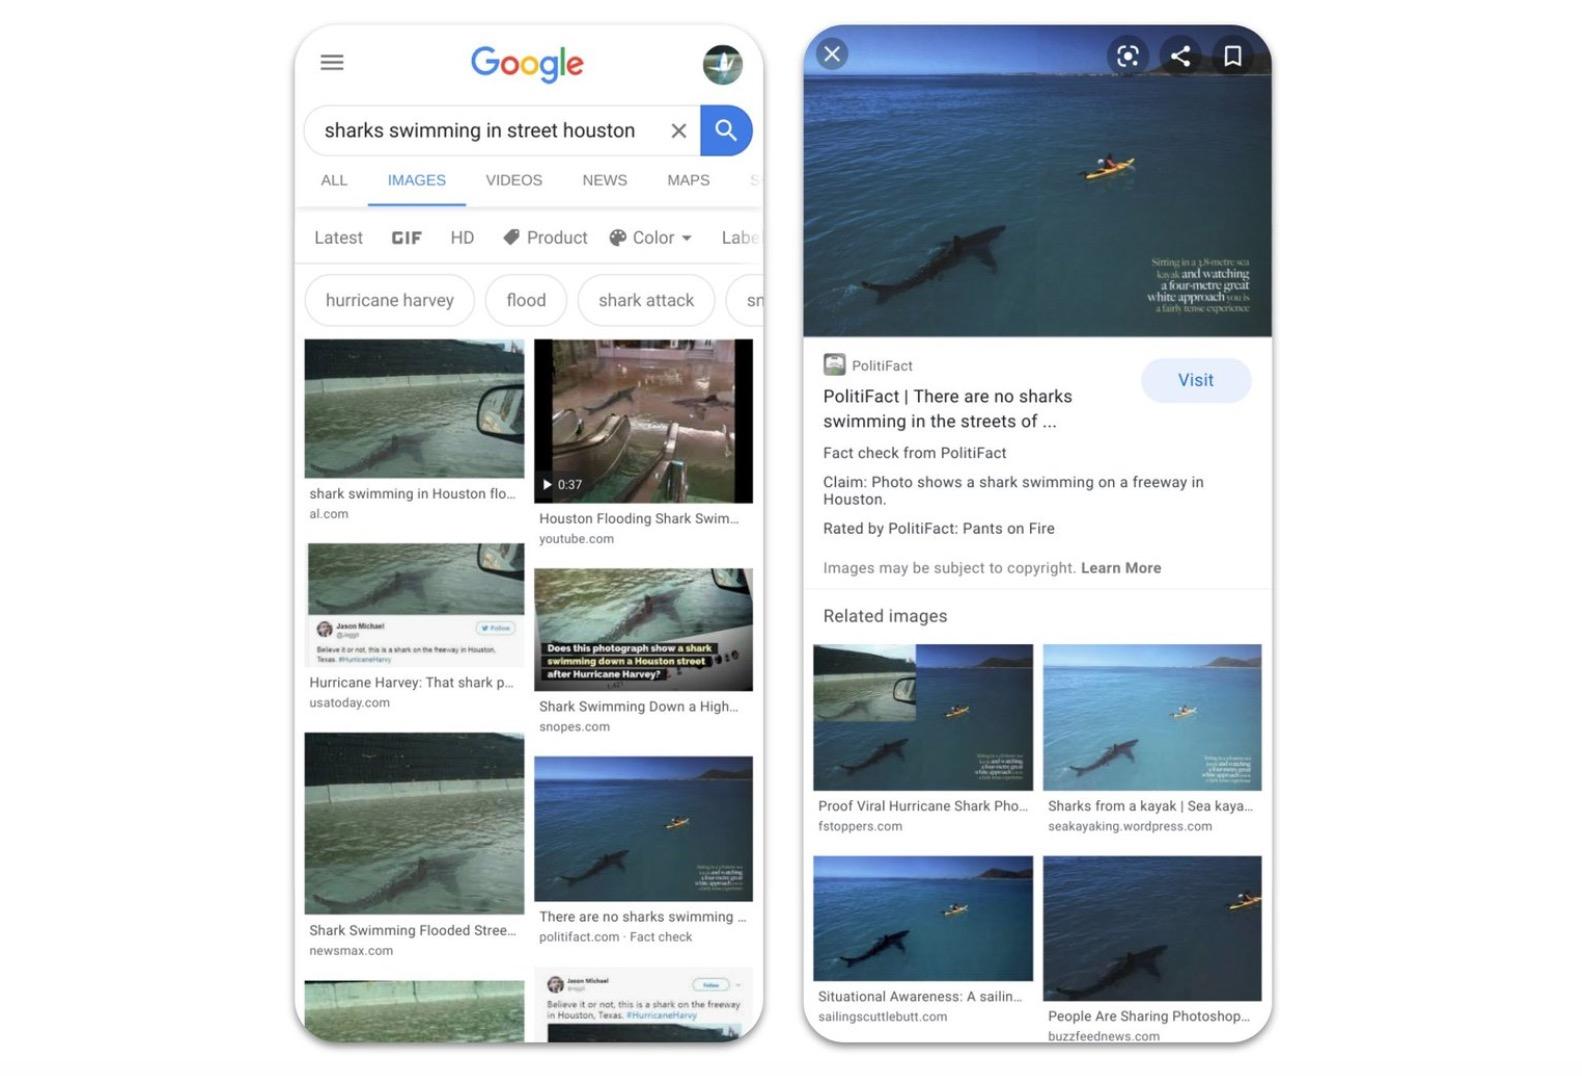 Google to bring contextual fact-checking features to images - RapidAPI